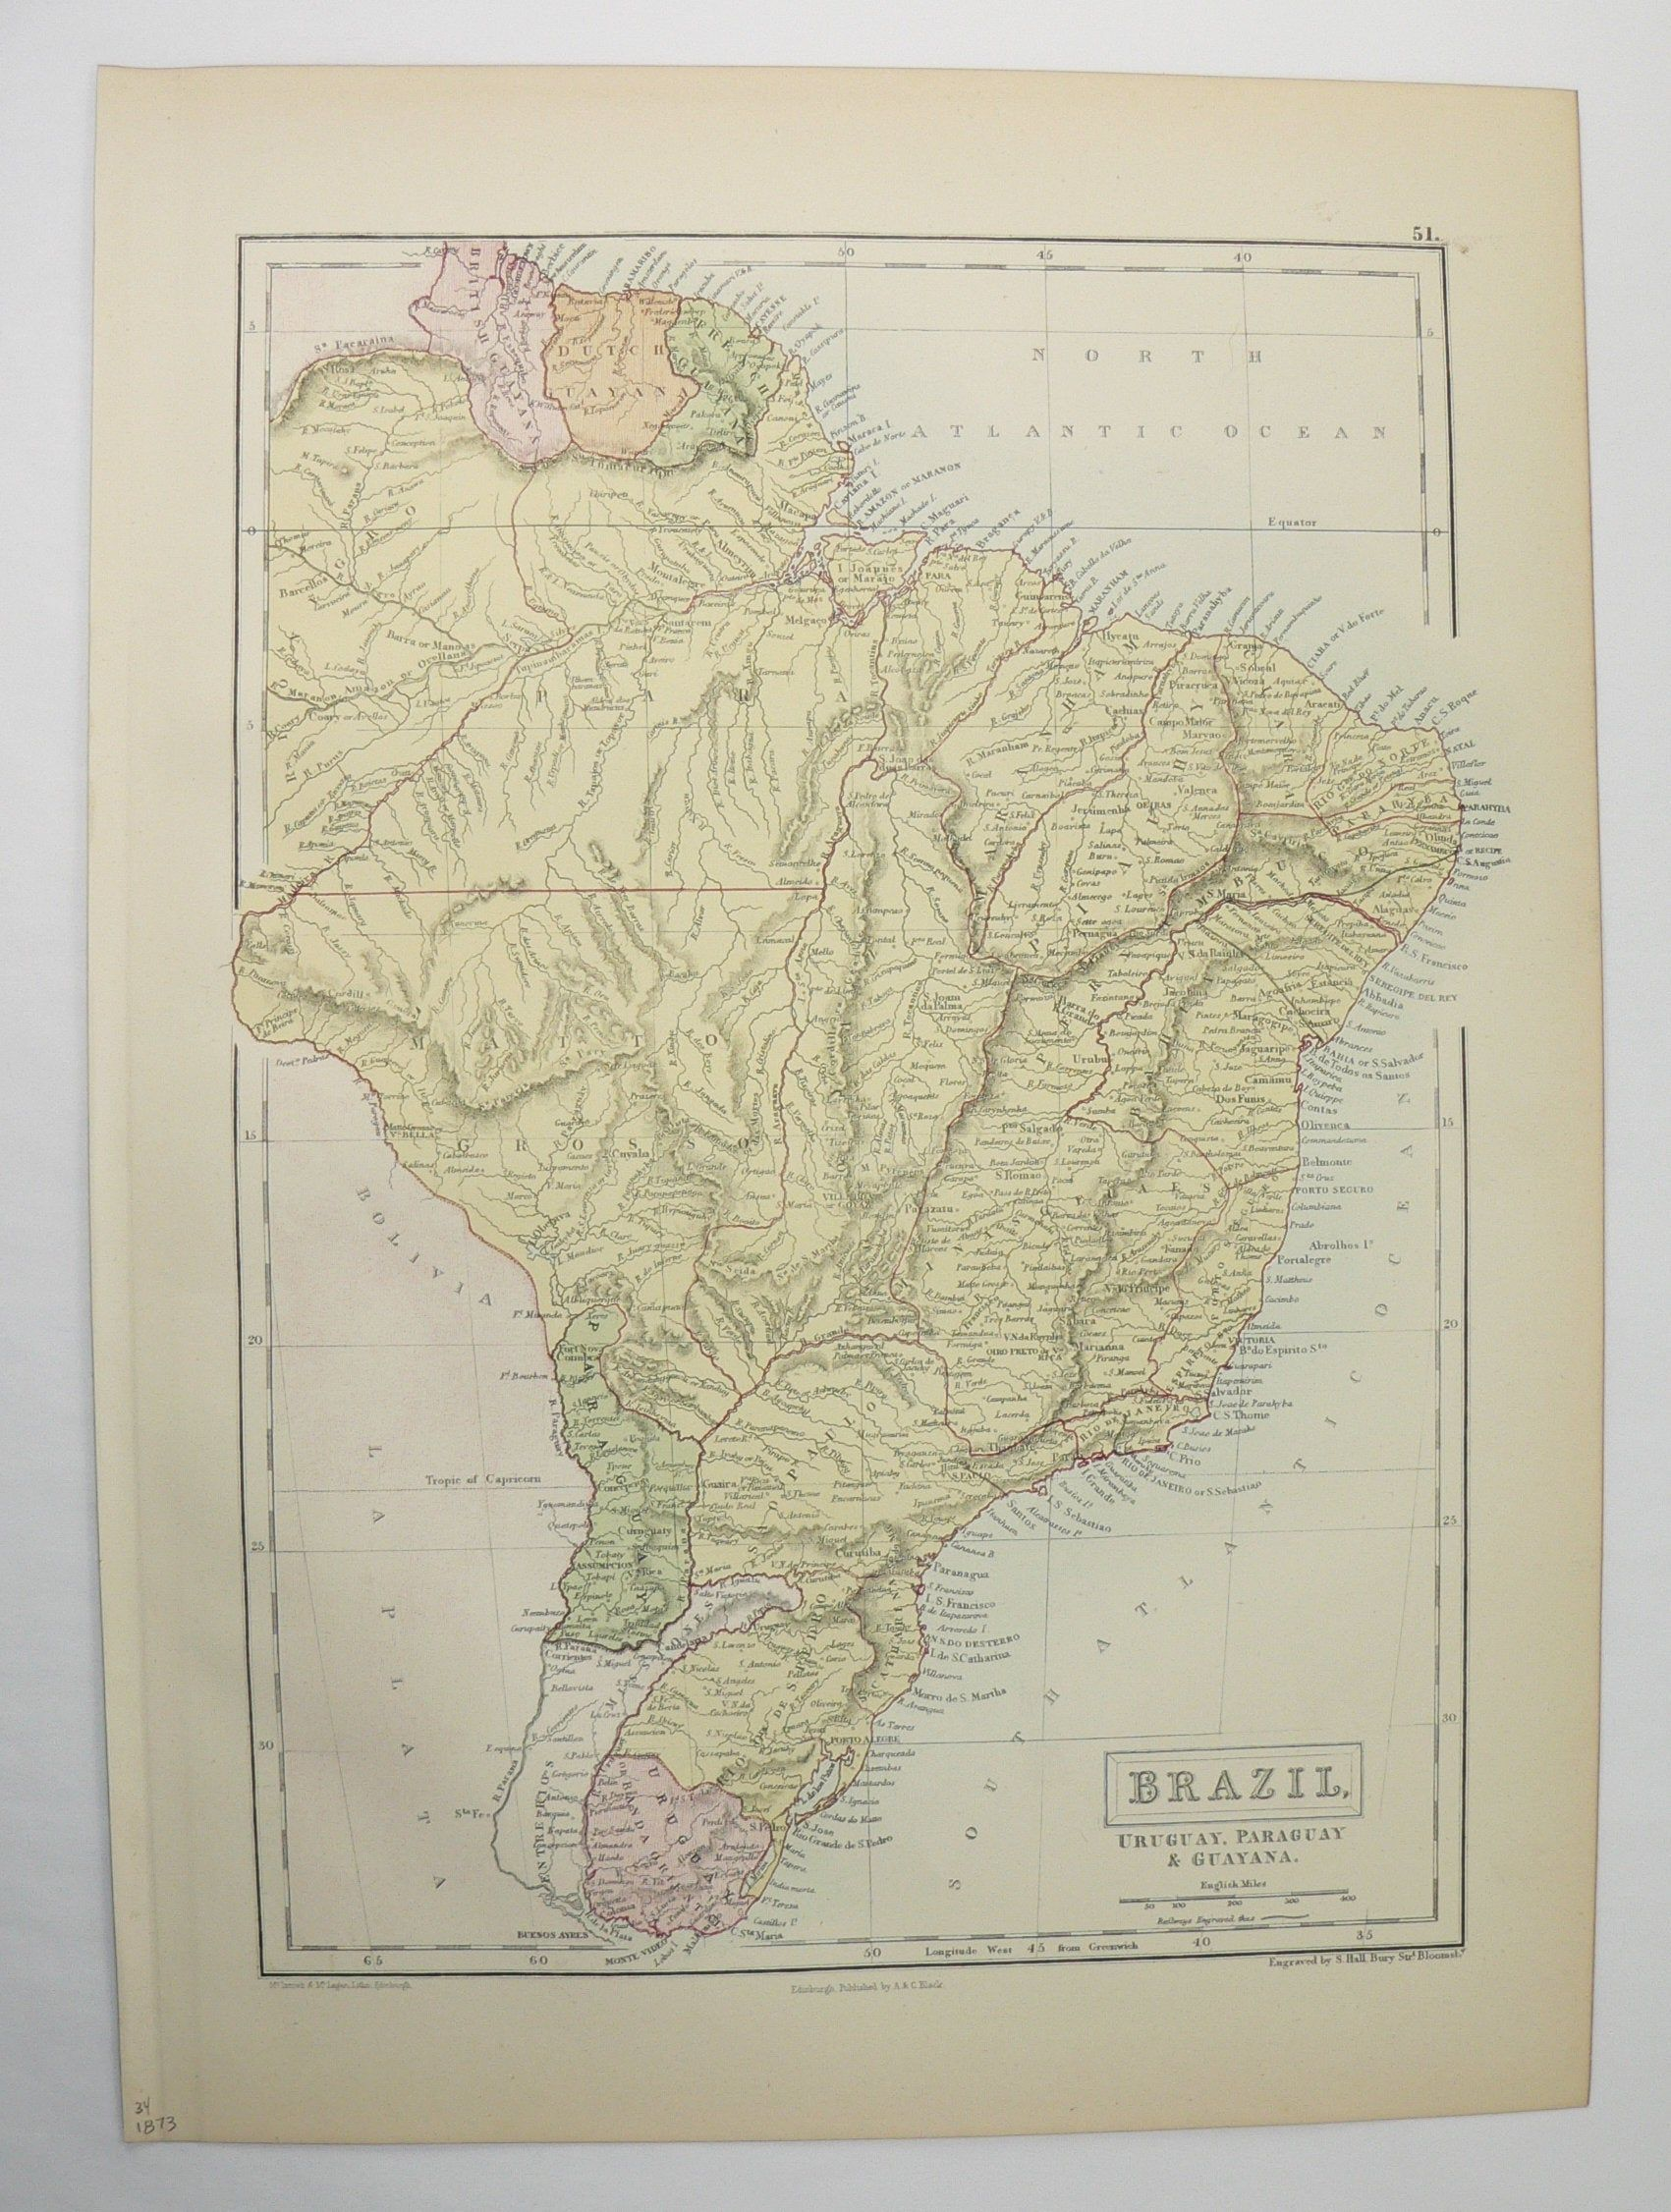 Original Antique Map Of Brazil South America 1873 A C Black Map